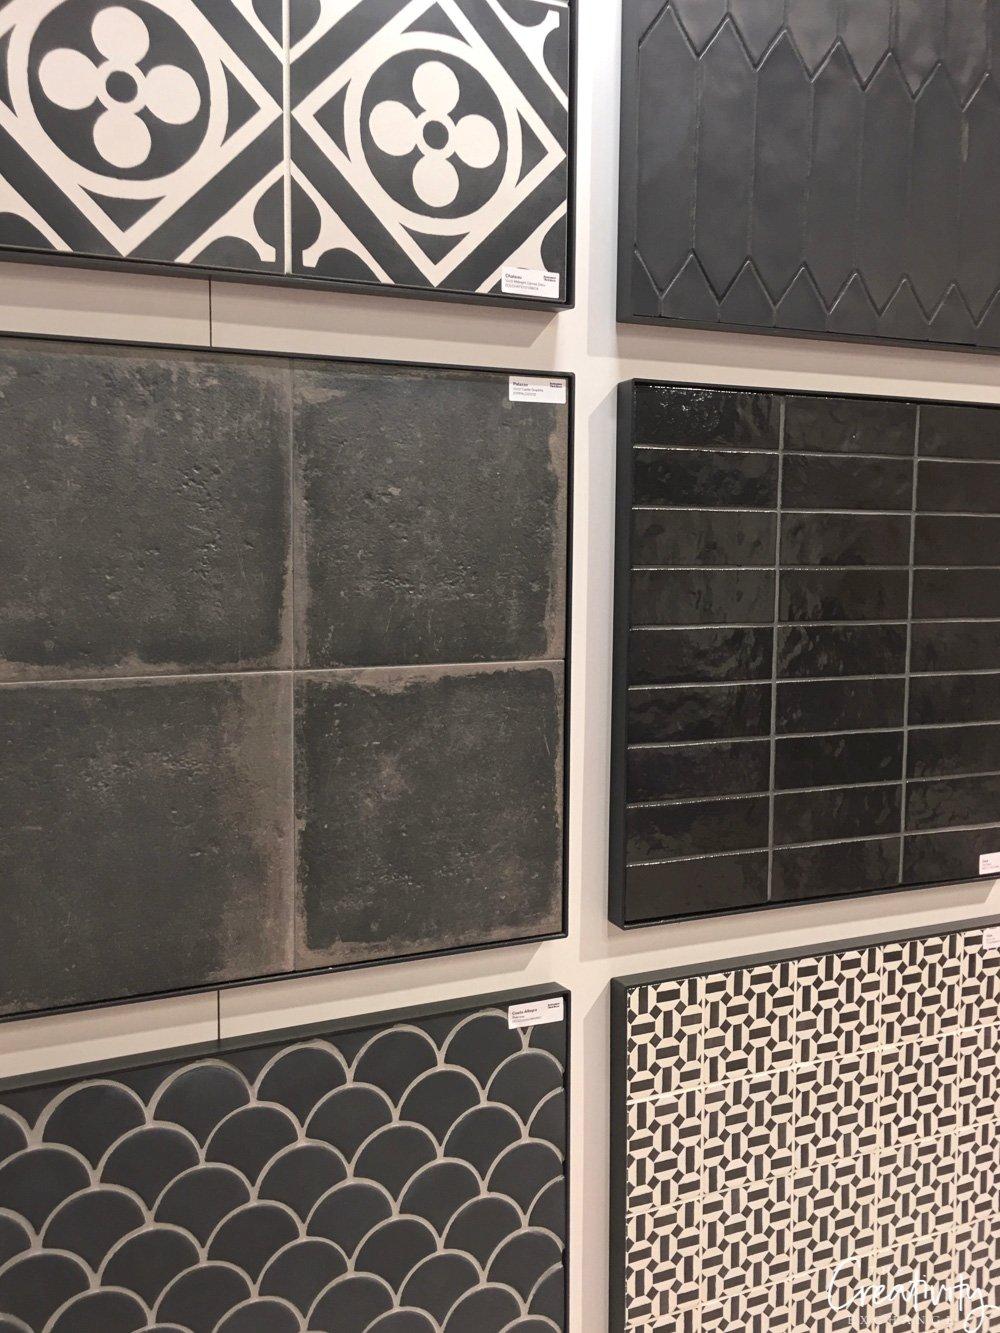 Matte black cement tile from Bedrosians